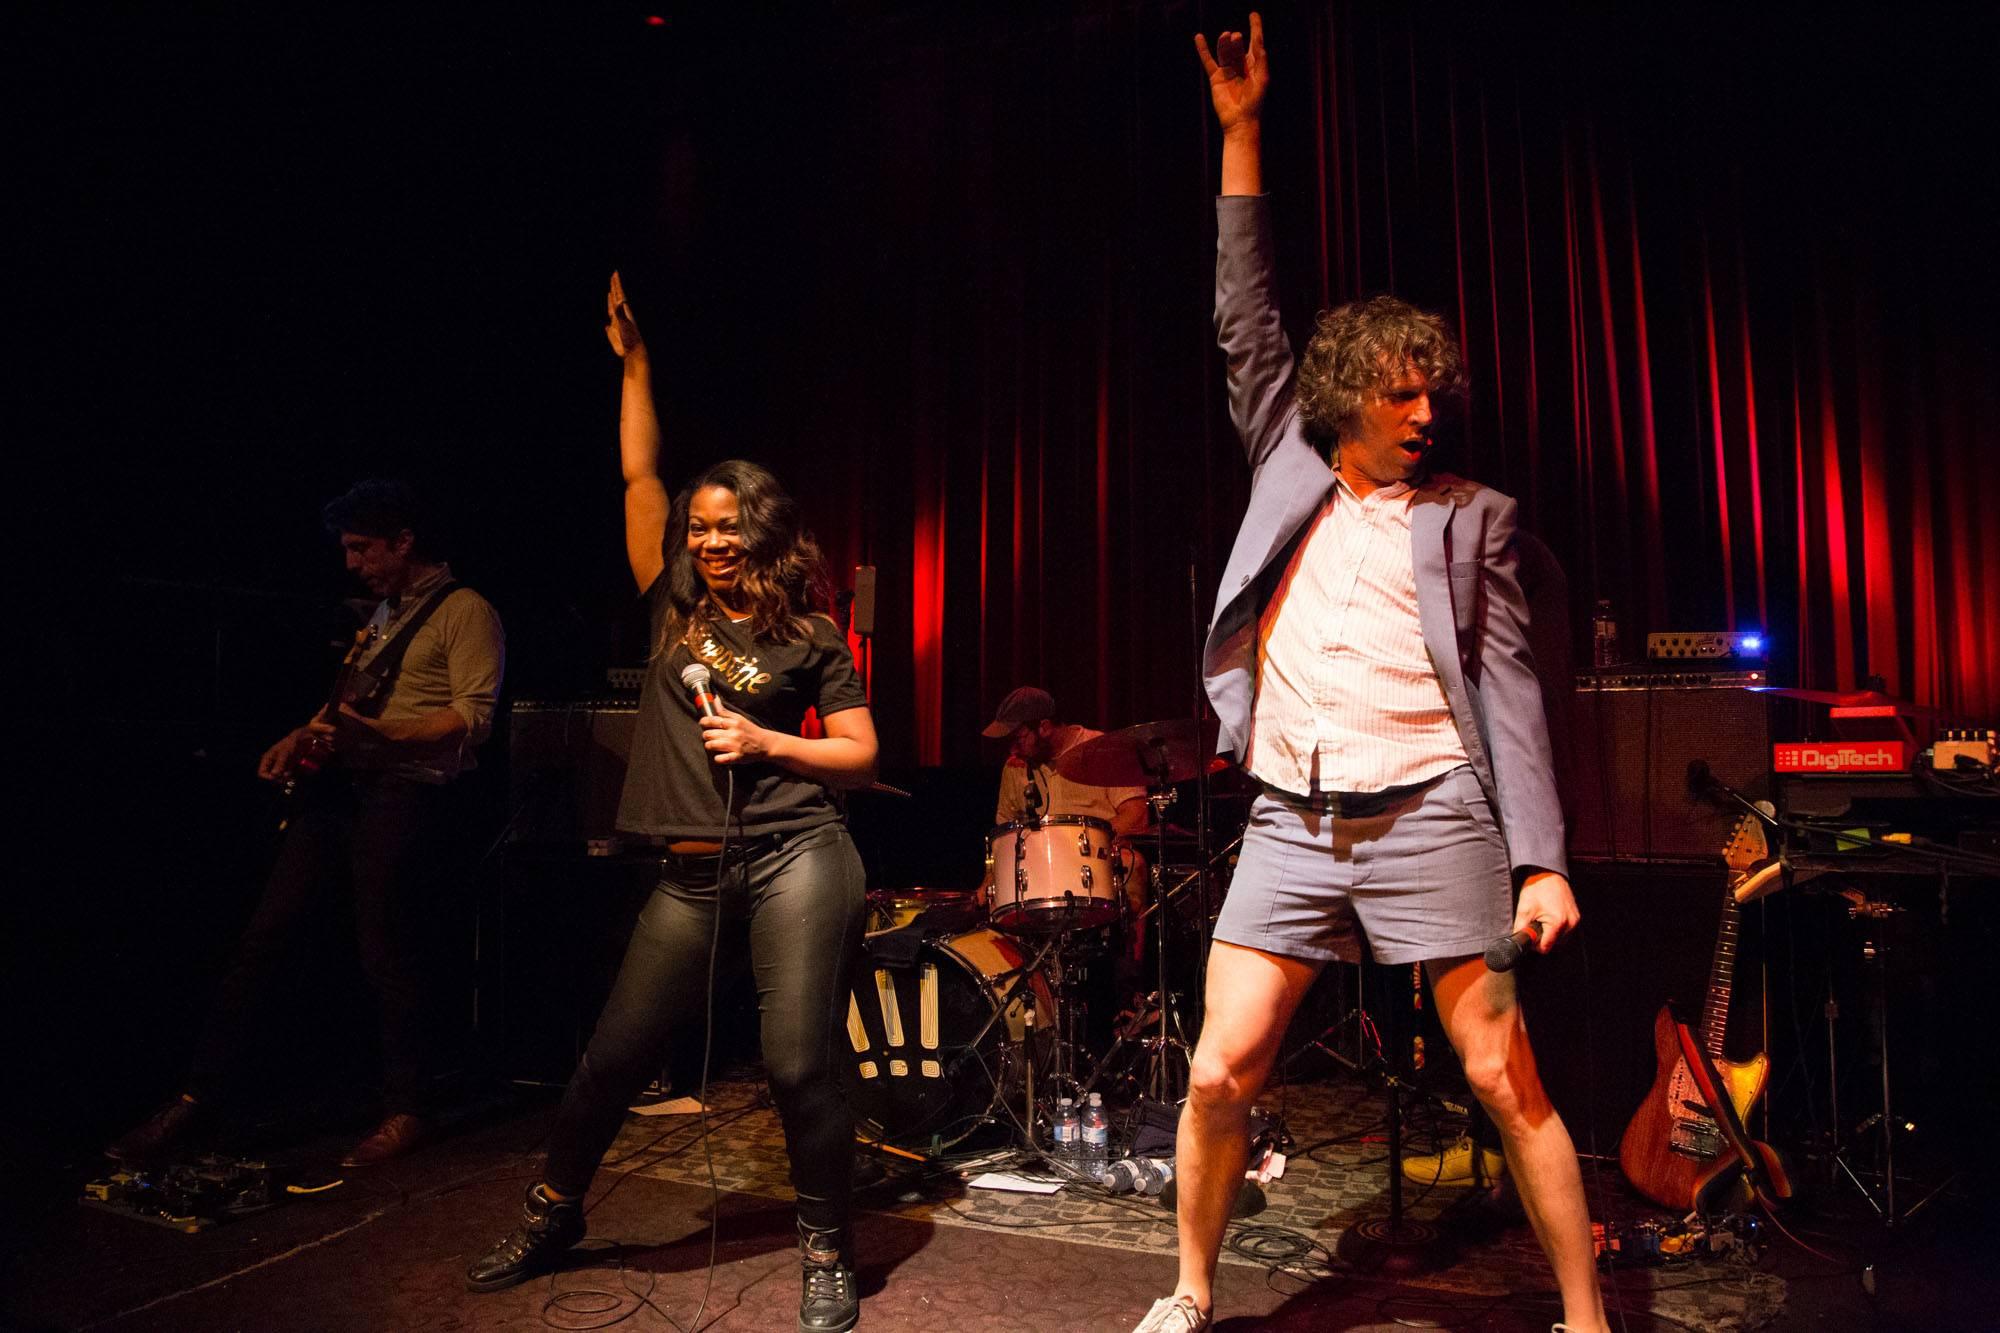 !!! (Chk Chk Chk) at the Fox Cabaret, Vancouver, June 27 2017. Kirk Chantraine photo.